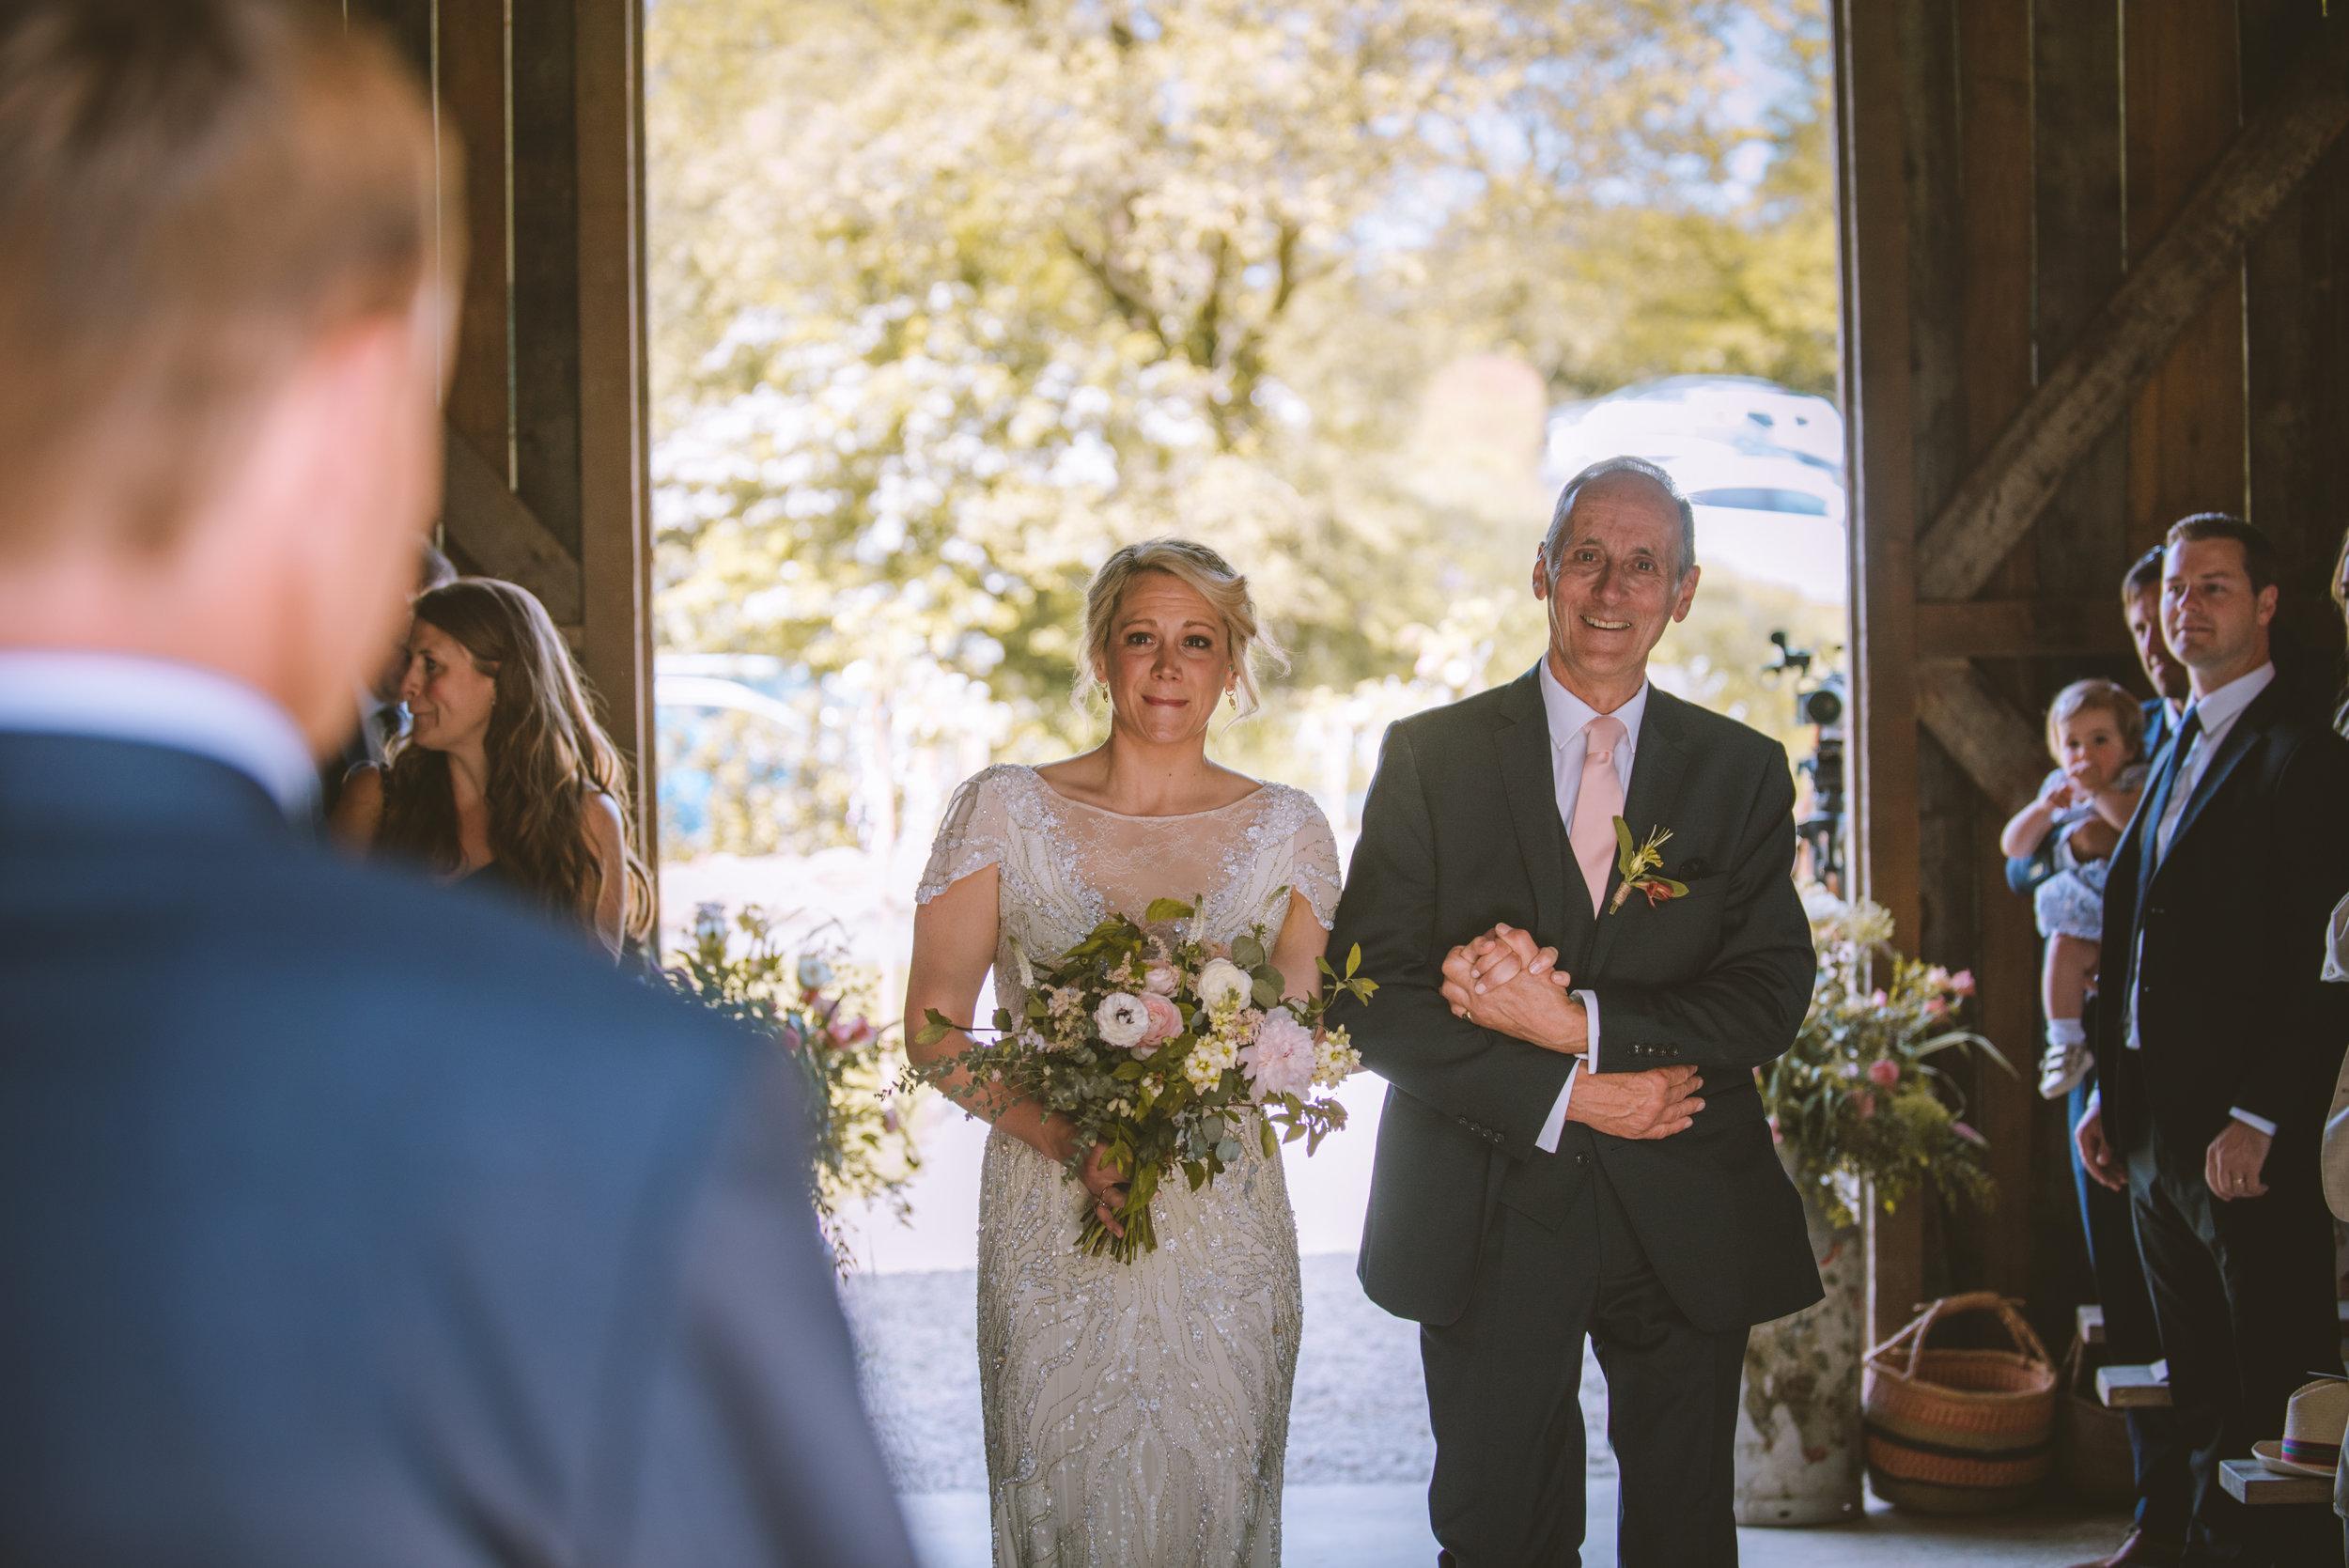 nancarrow-wedding-photography-31.jpg